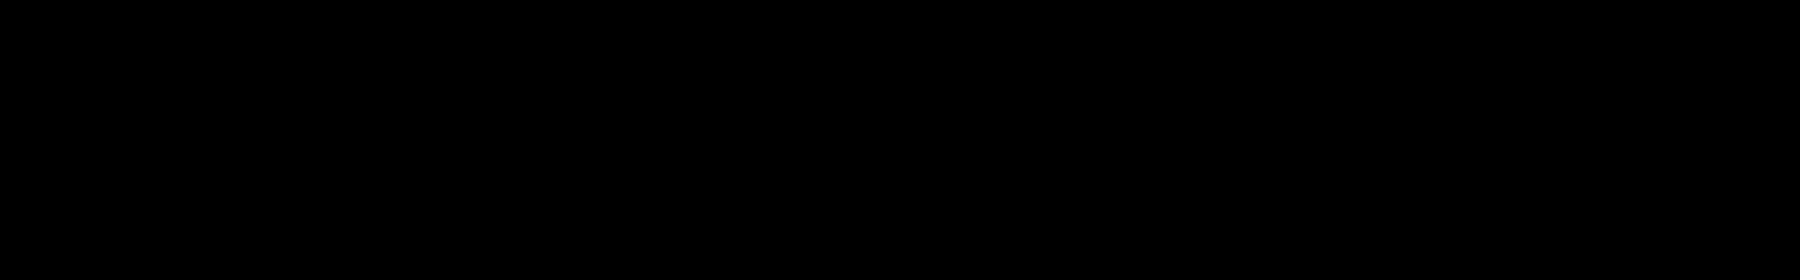 Riemann Distorted Kickdrums 4 audio waveform